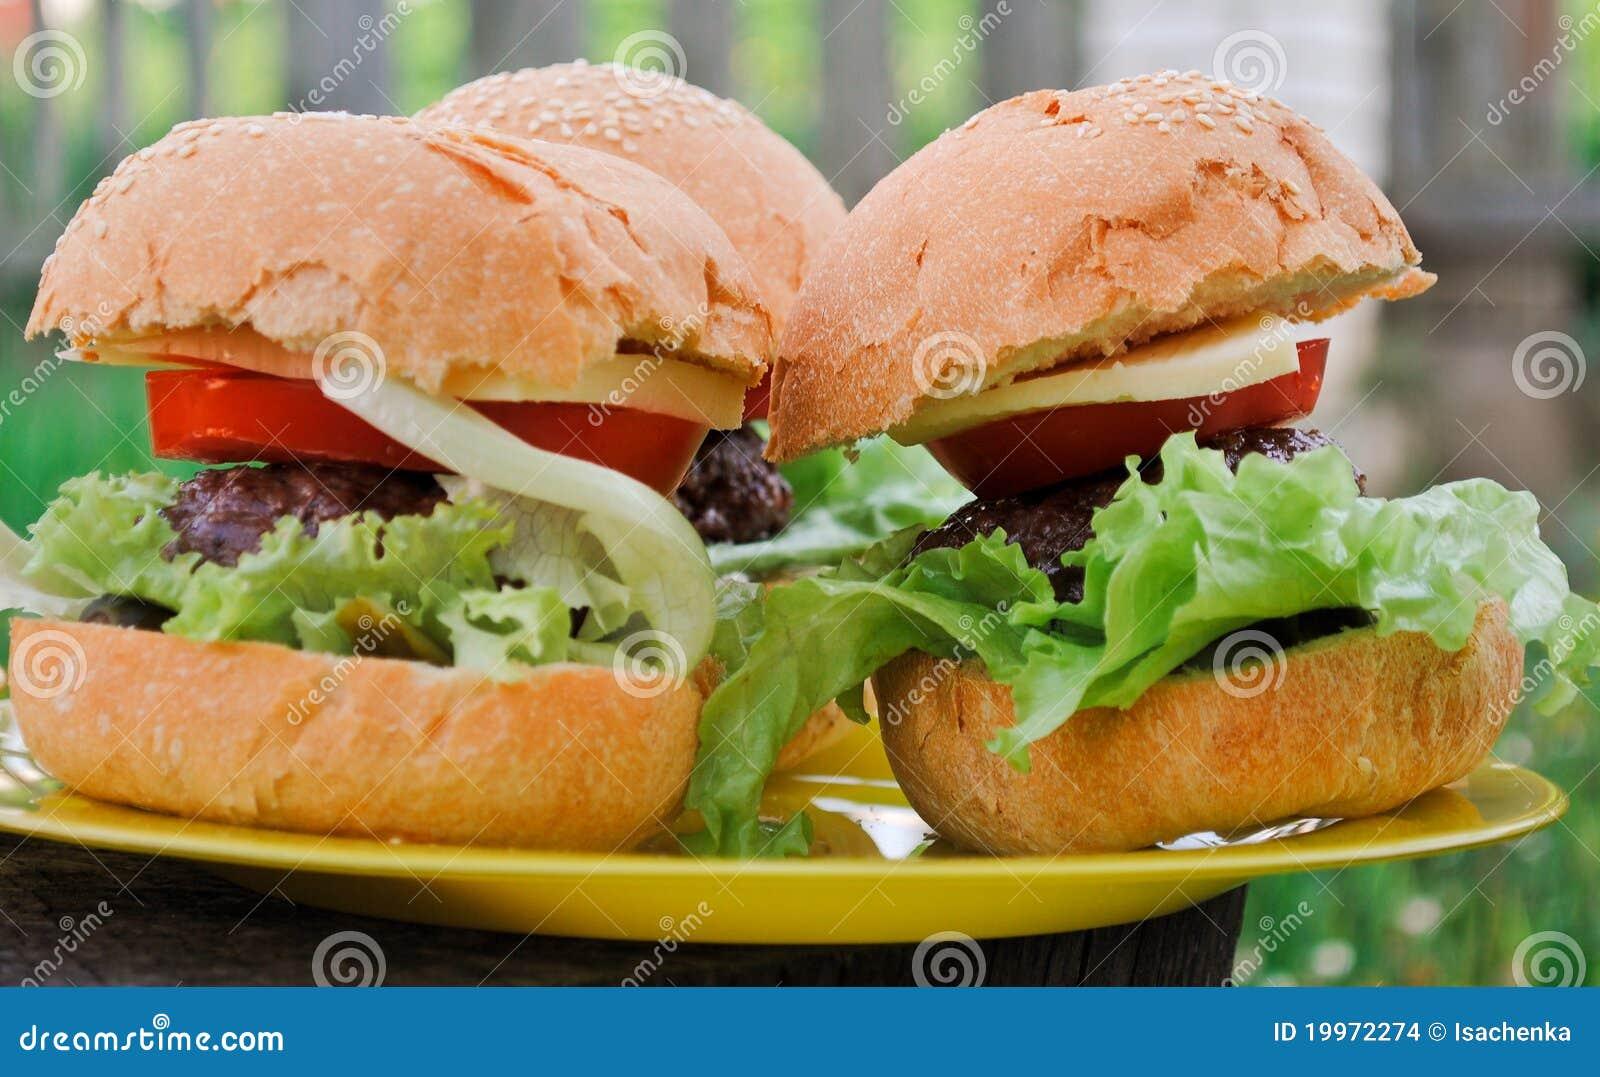 Cheeseburgers Faits Maison Images stock - Image: 19972274